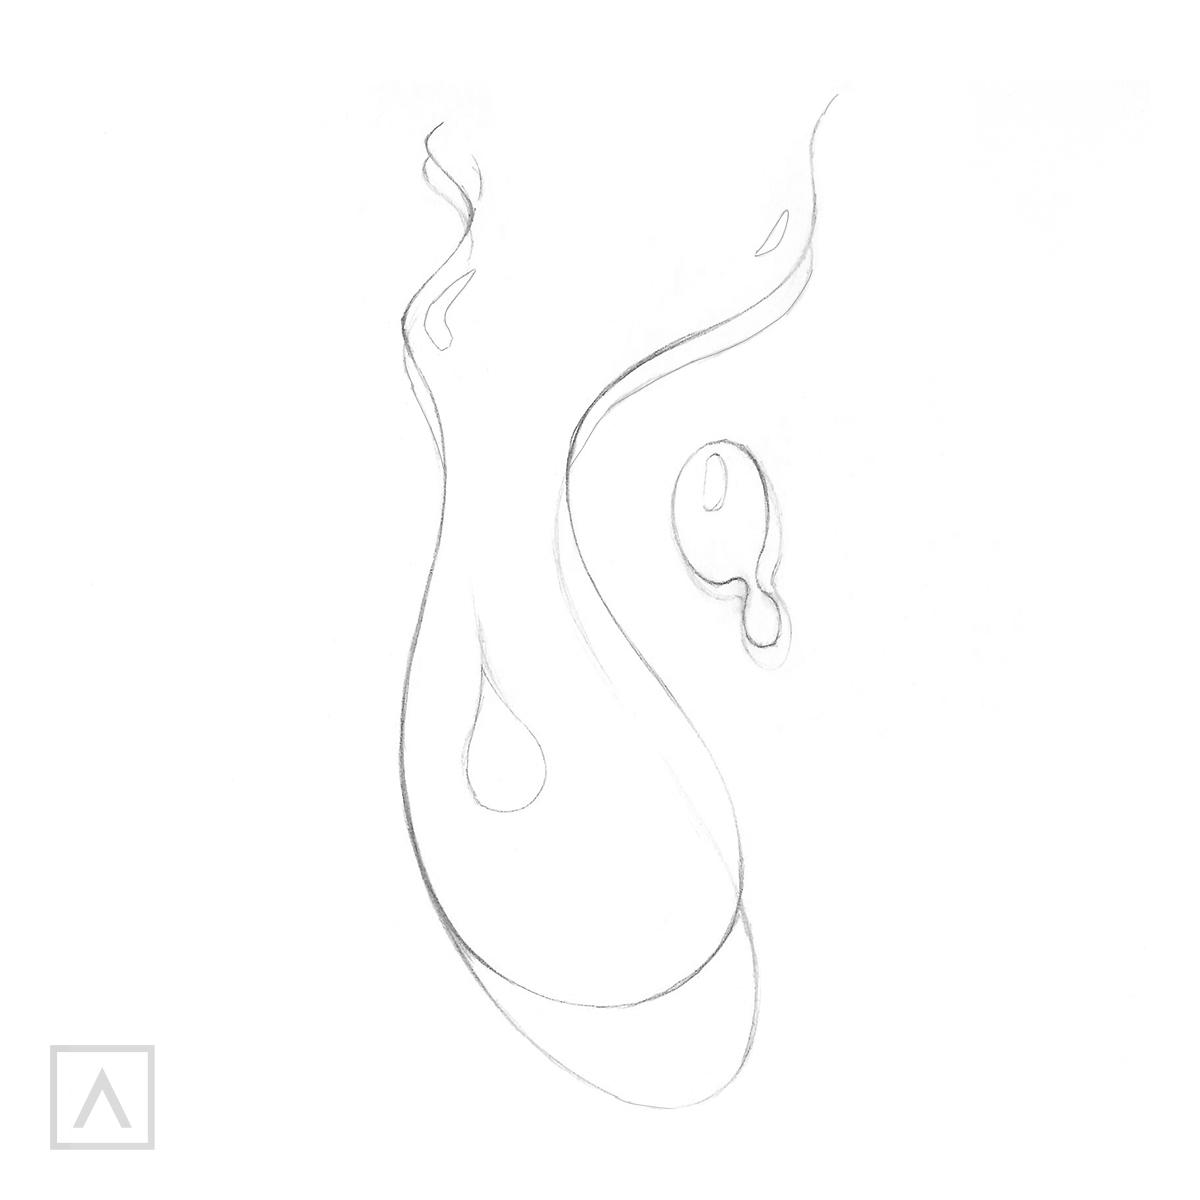 Image of a tear step 2